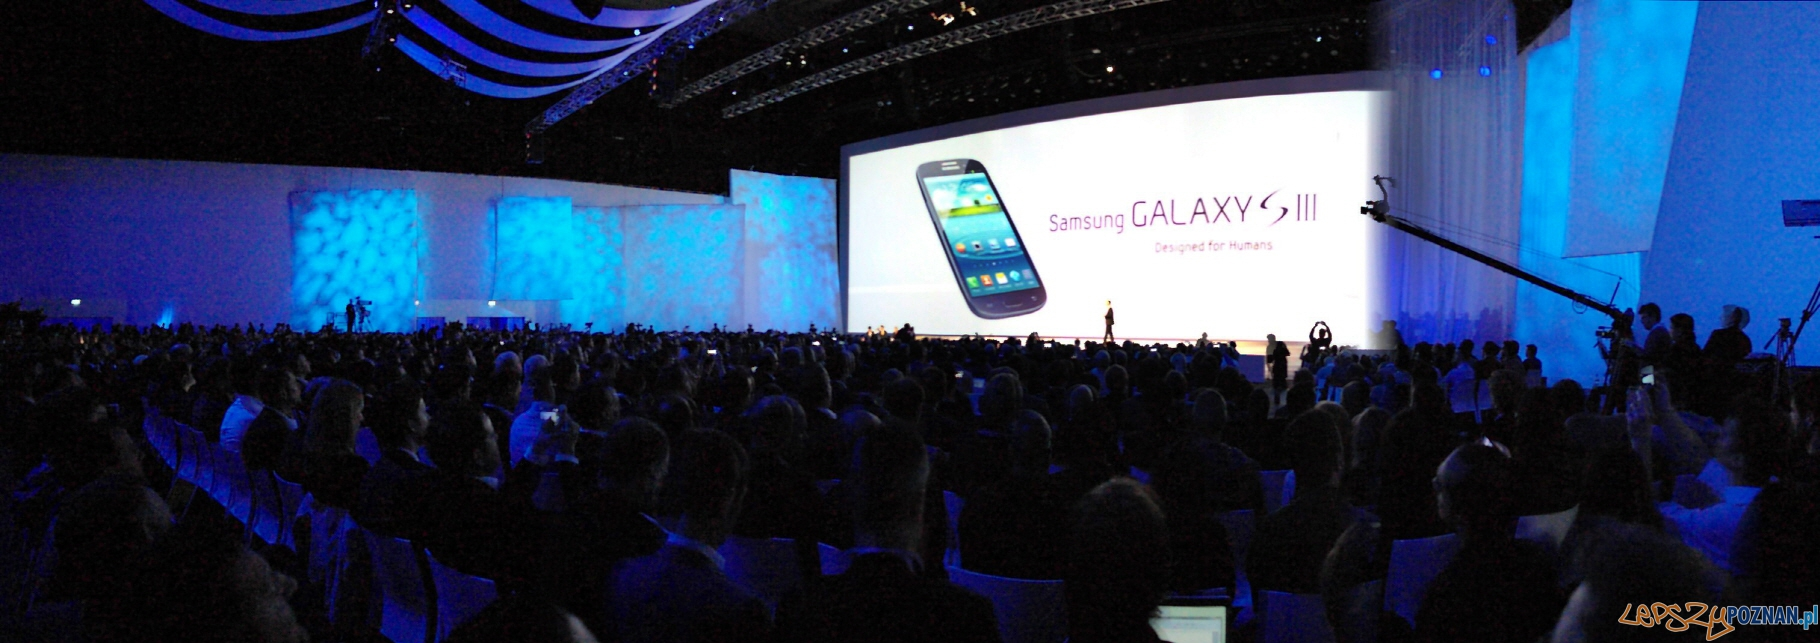 Premiera modelu Samsung Galaxy S III  Foto: Samsung